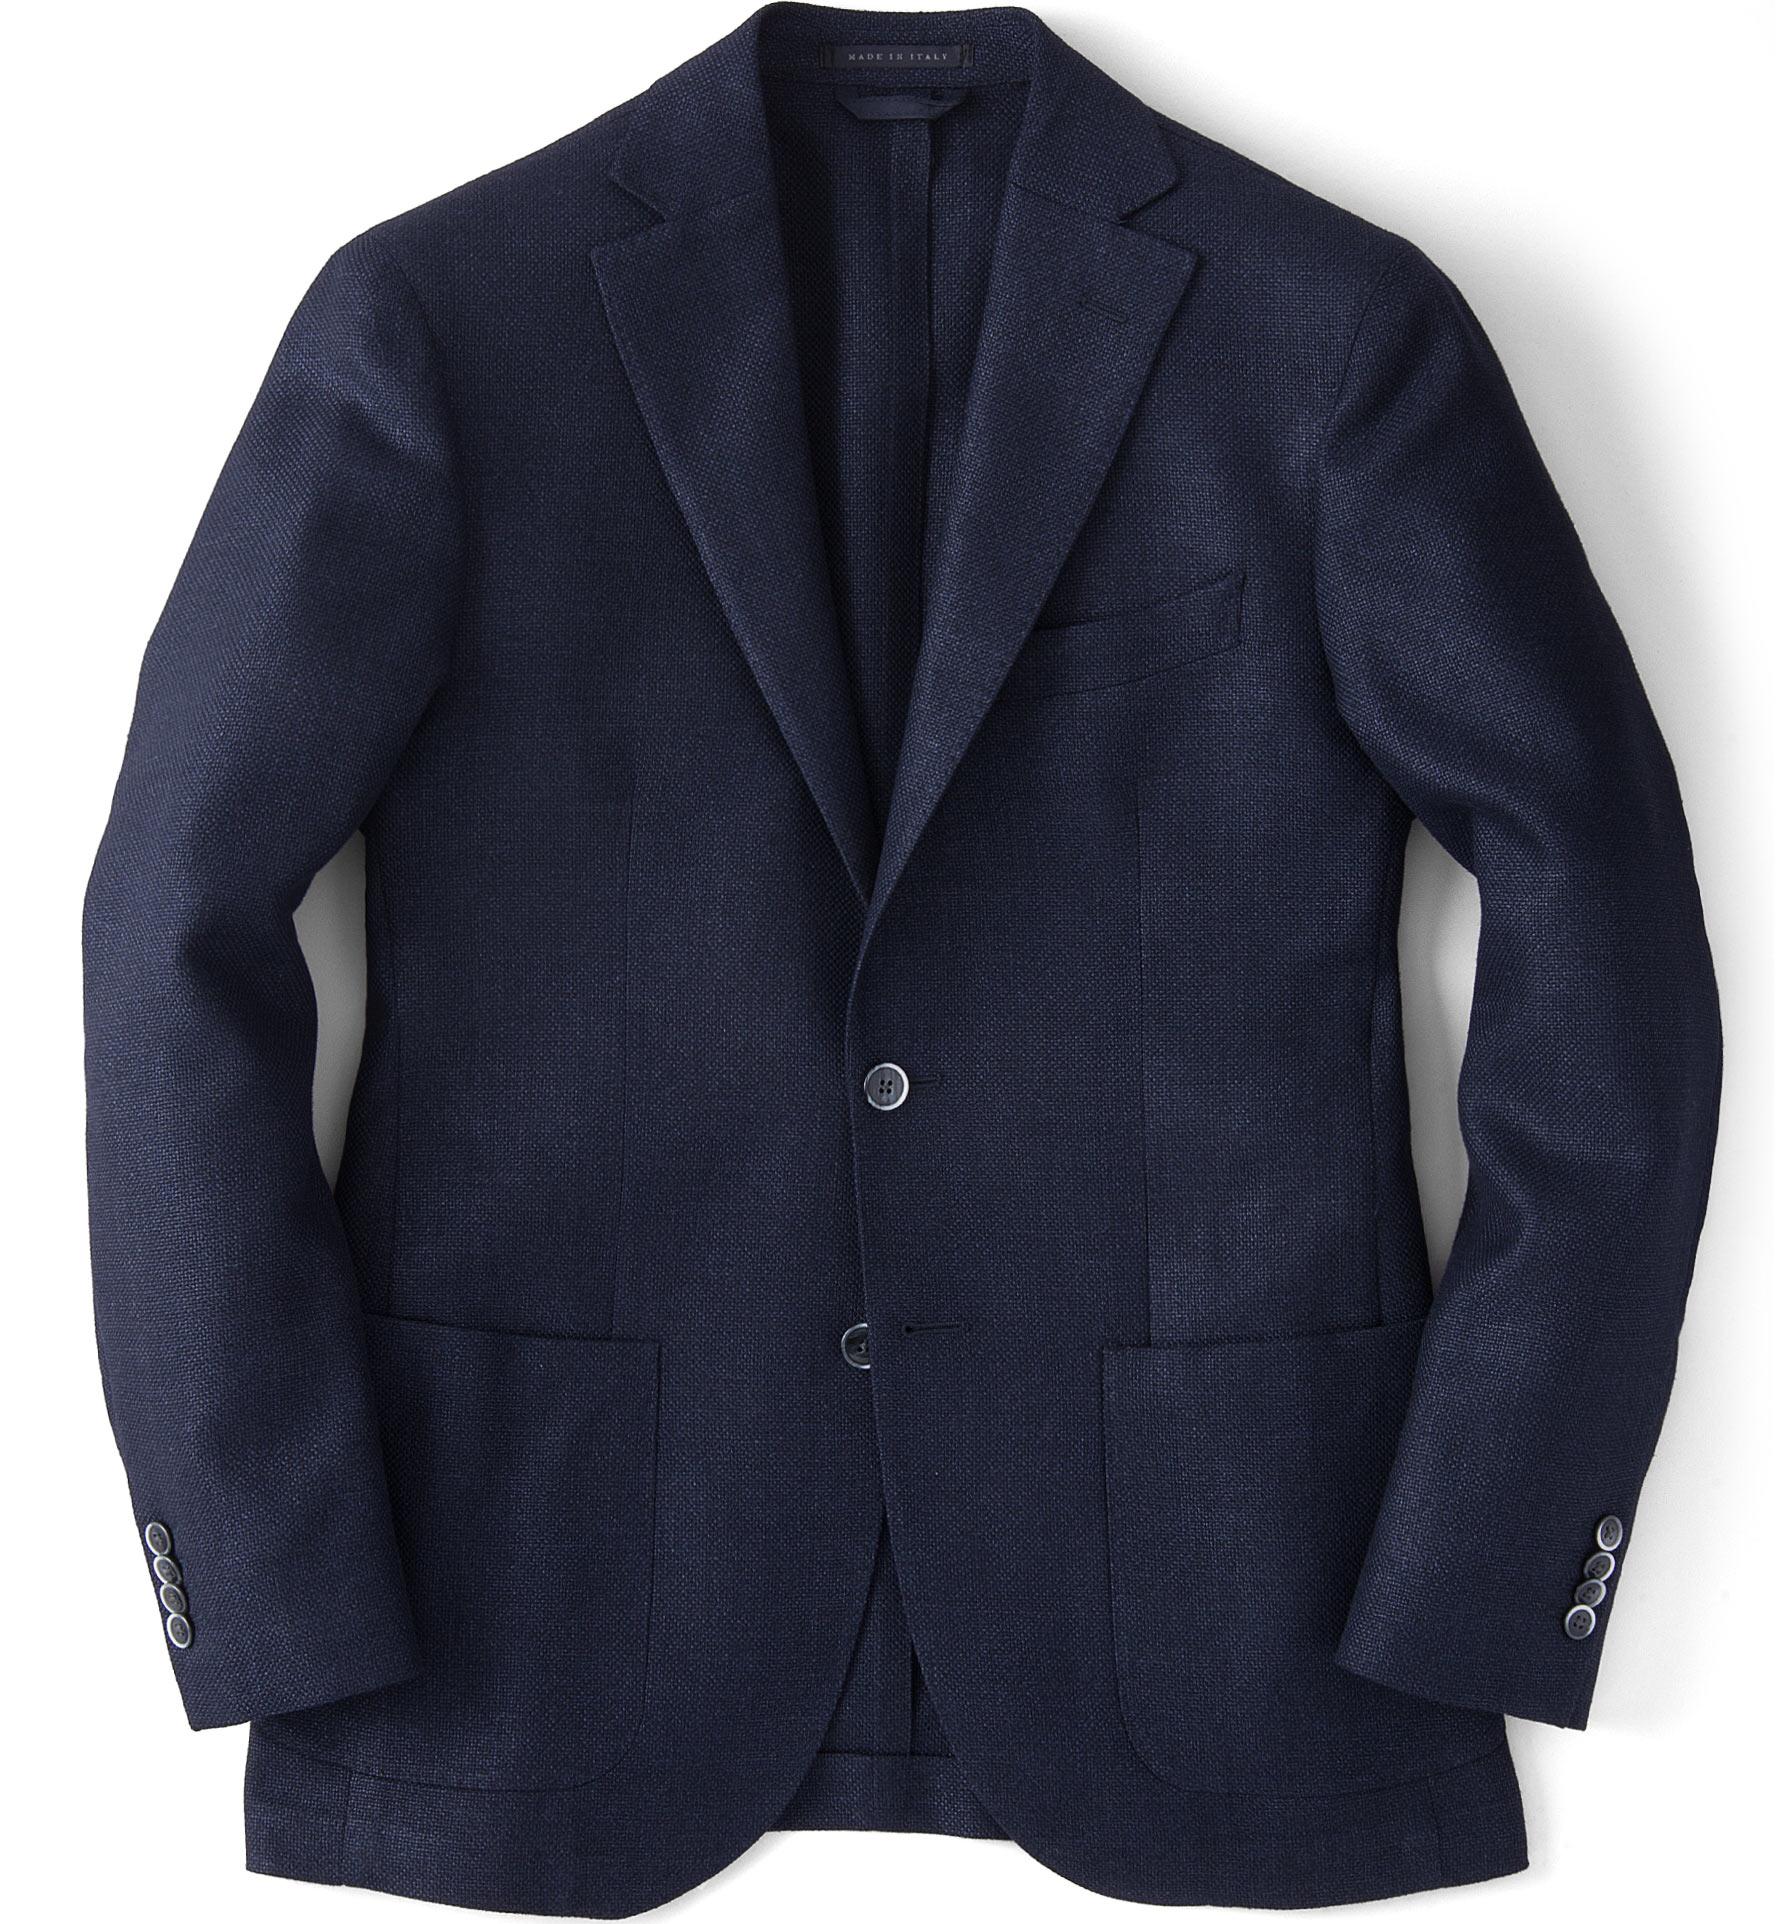 Zoom Image of Navy Basketweave Genova Jacket